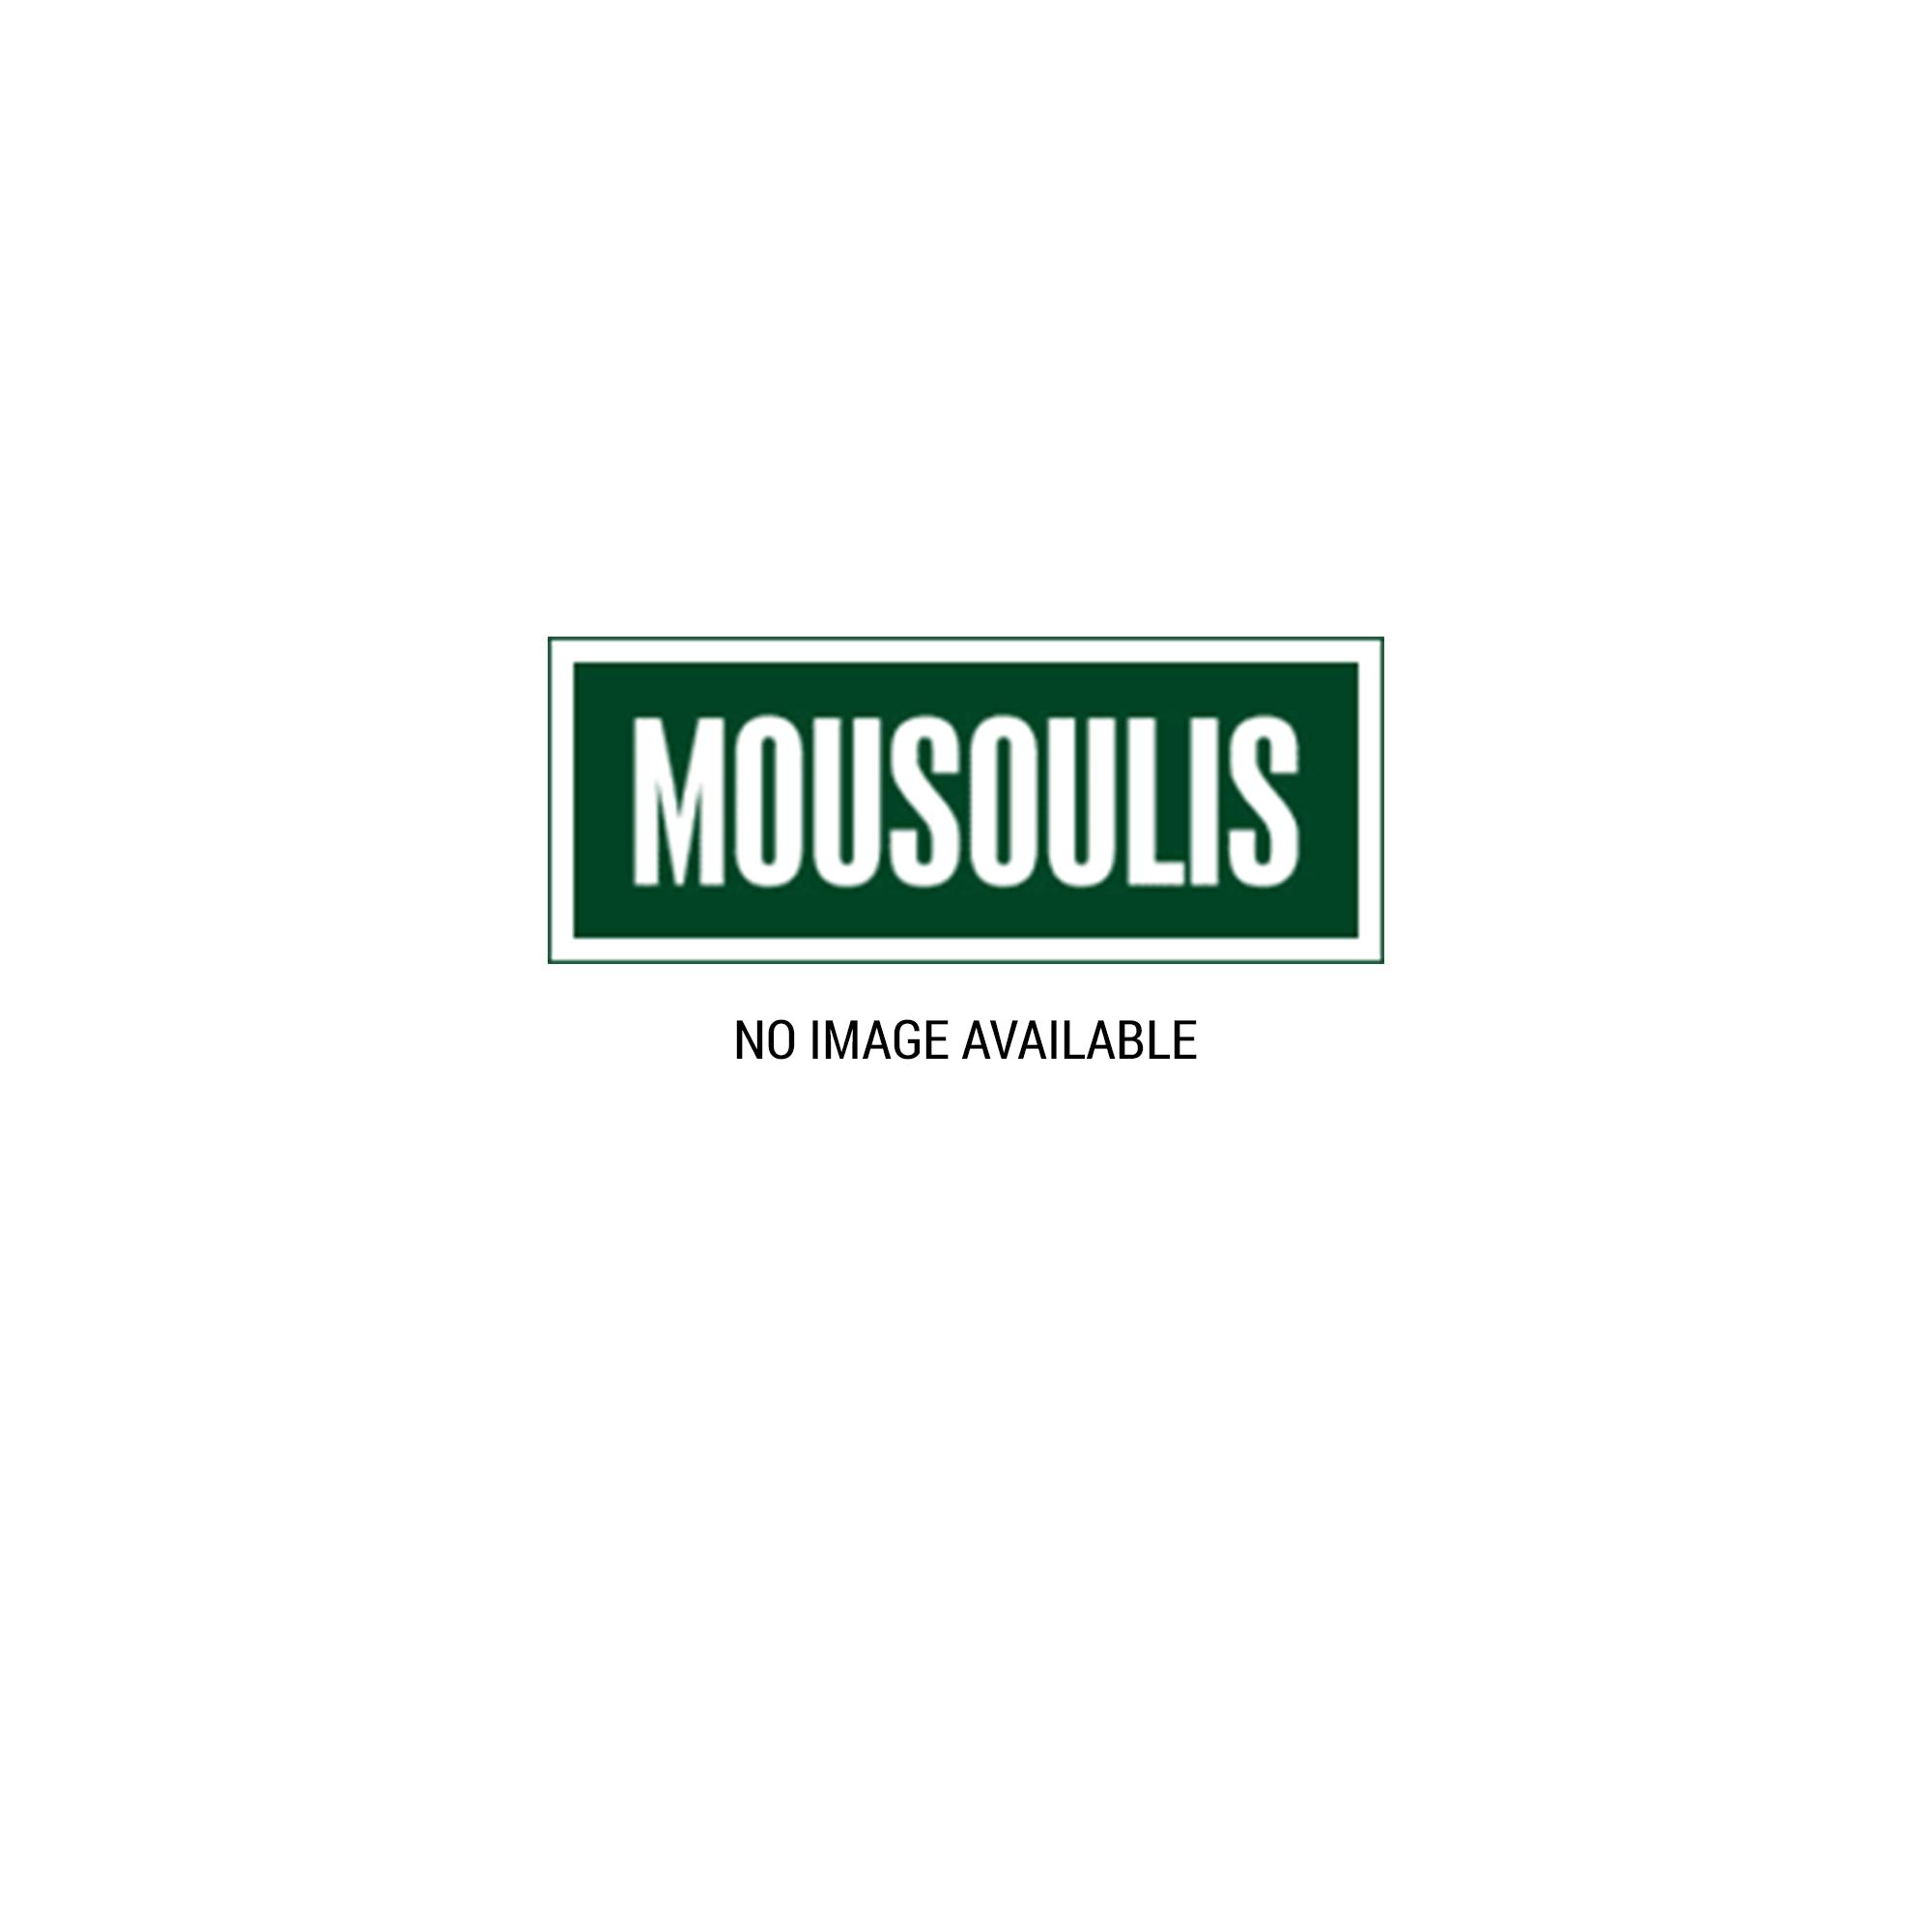 Barbour Lifestyle Κασκόλ Μάλλινο Μονόχρωμο με Κρόσια Plain Lambswool USC0008 Μωβ